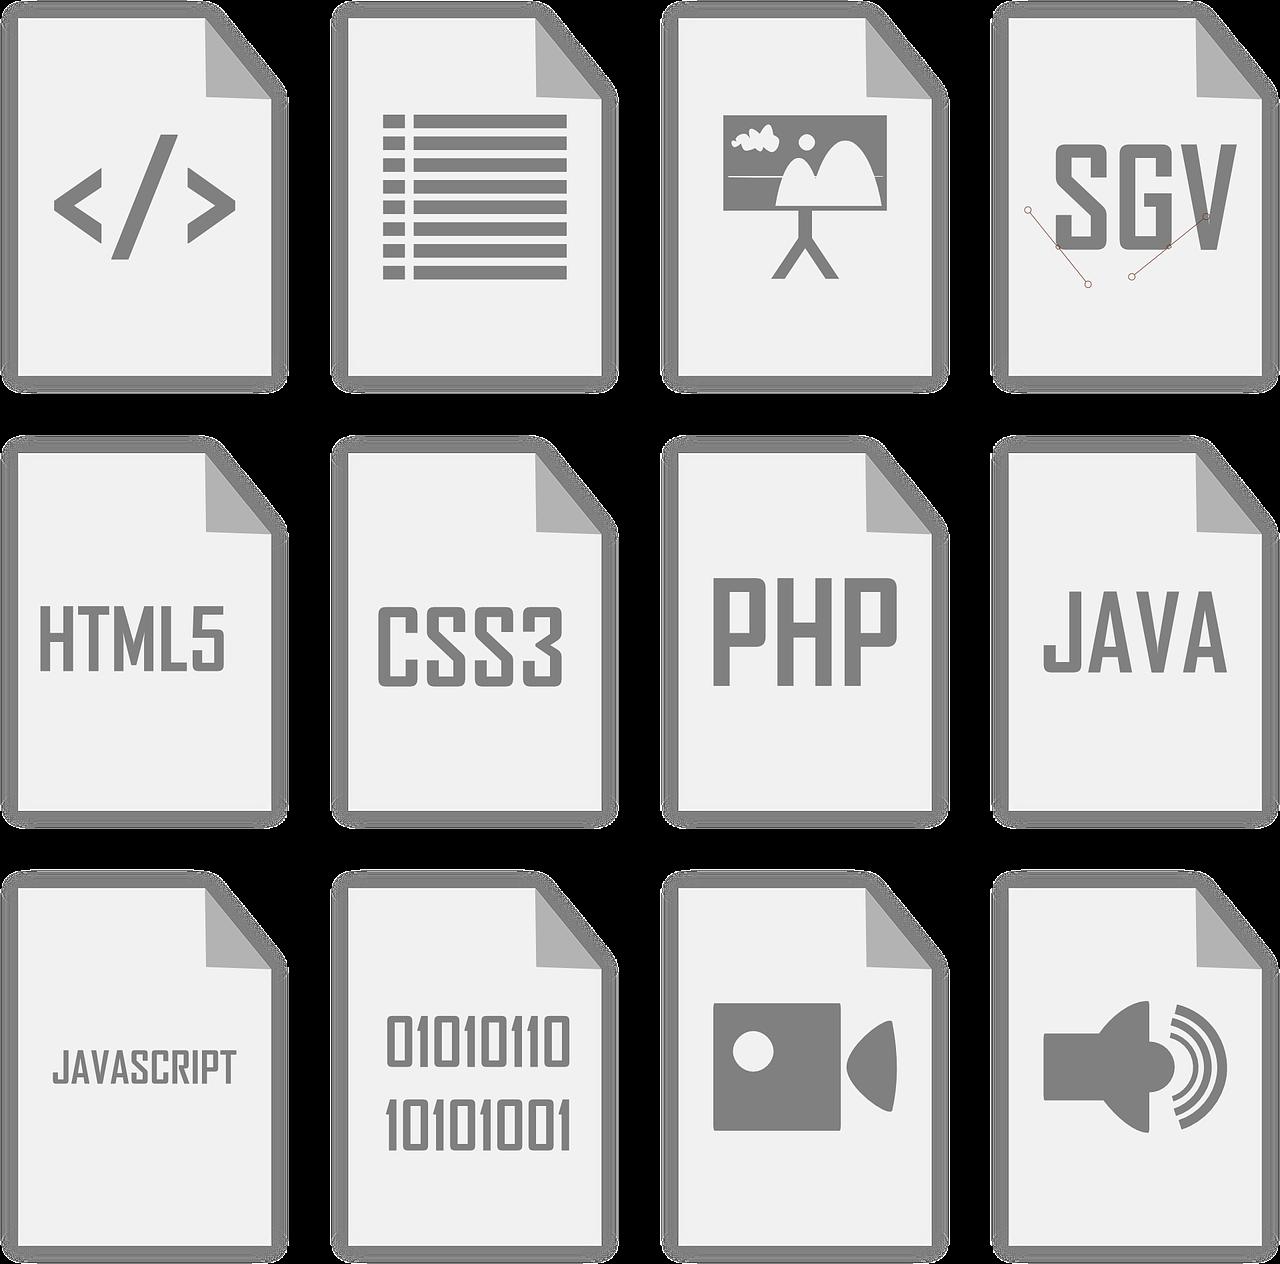 https://pixabay.com/de/esche-symbole-vektoren-html5-java-644451/